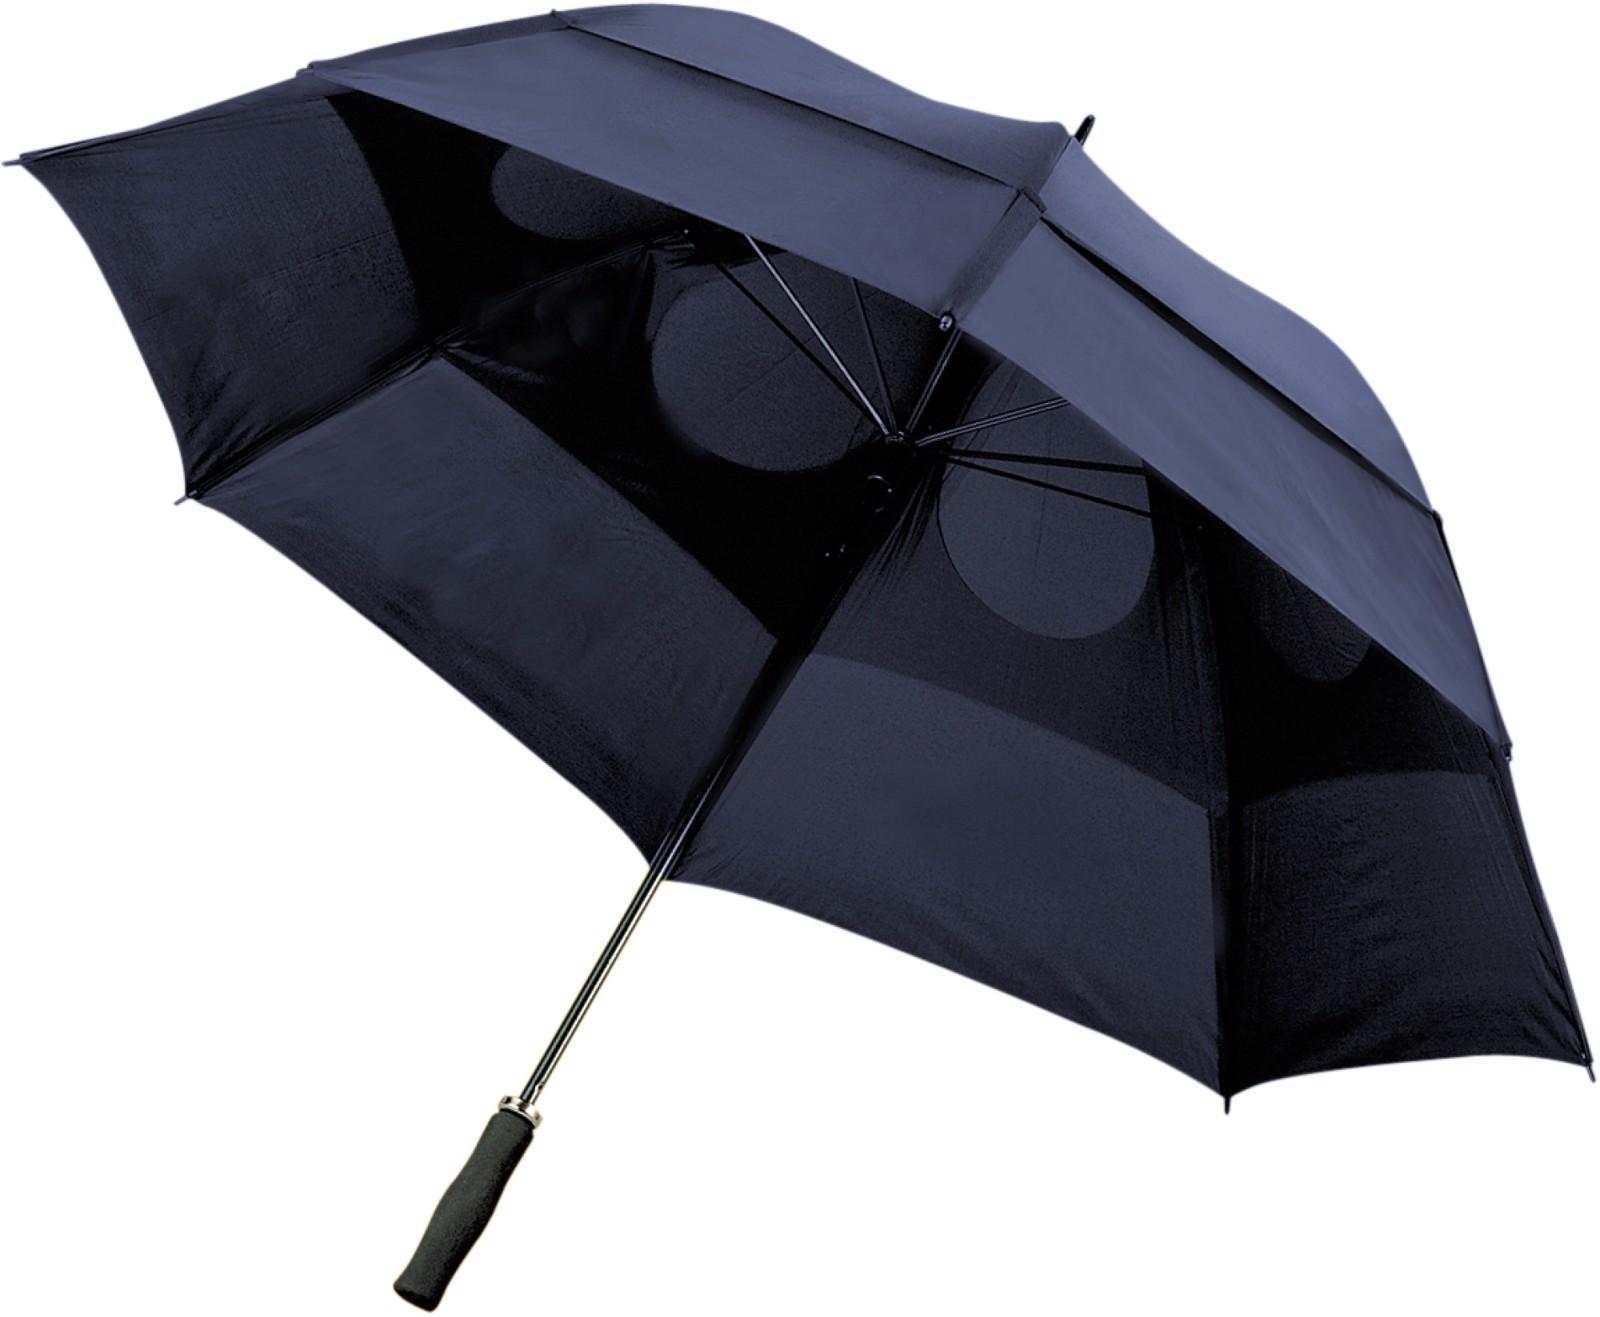 Polyester (210T) umbrella - Blue